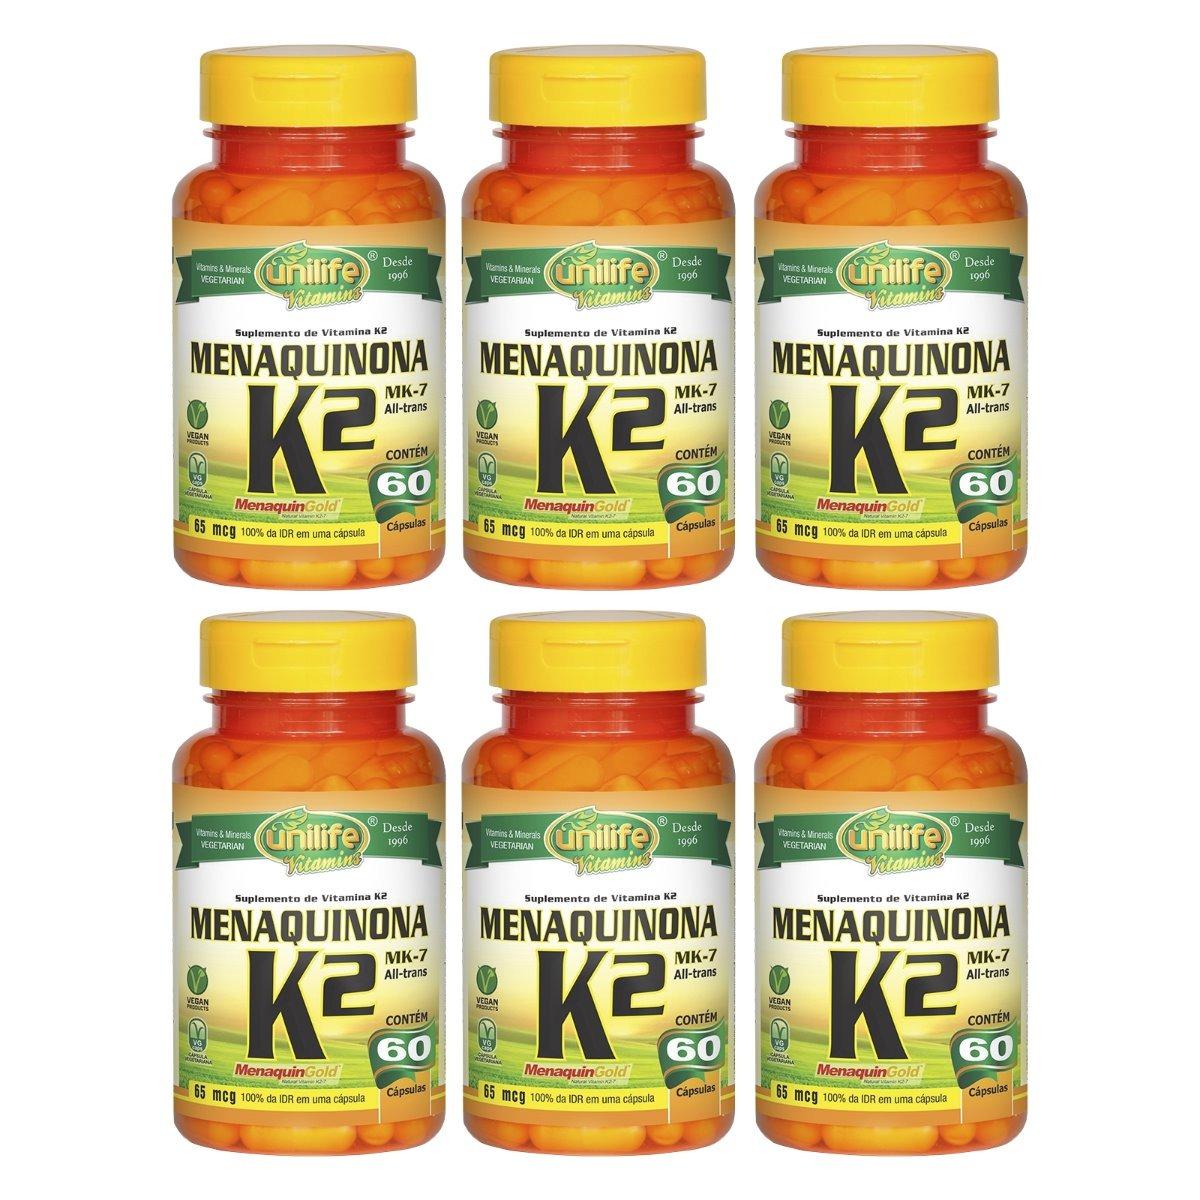 Vitamina K2 Menaquinona MK-7 60 Cápsulas Unilife Kit 6 Unidades